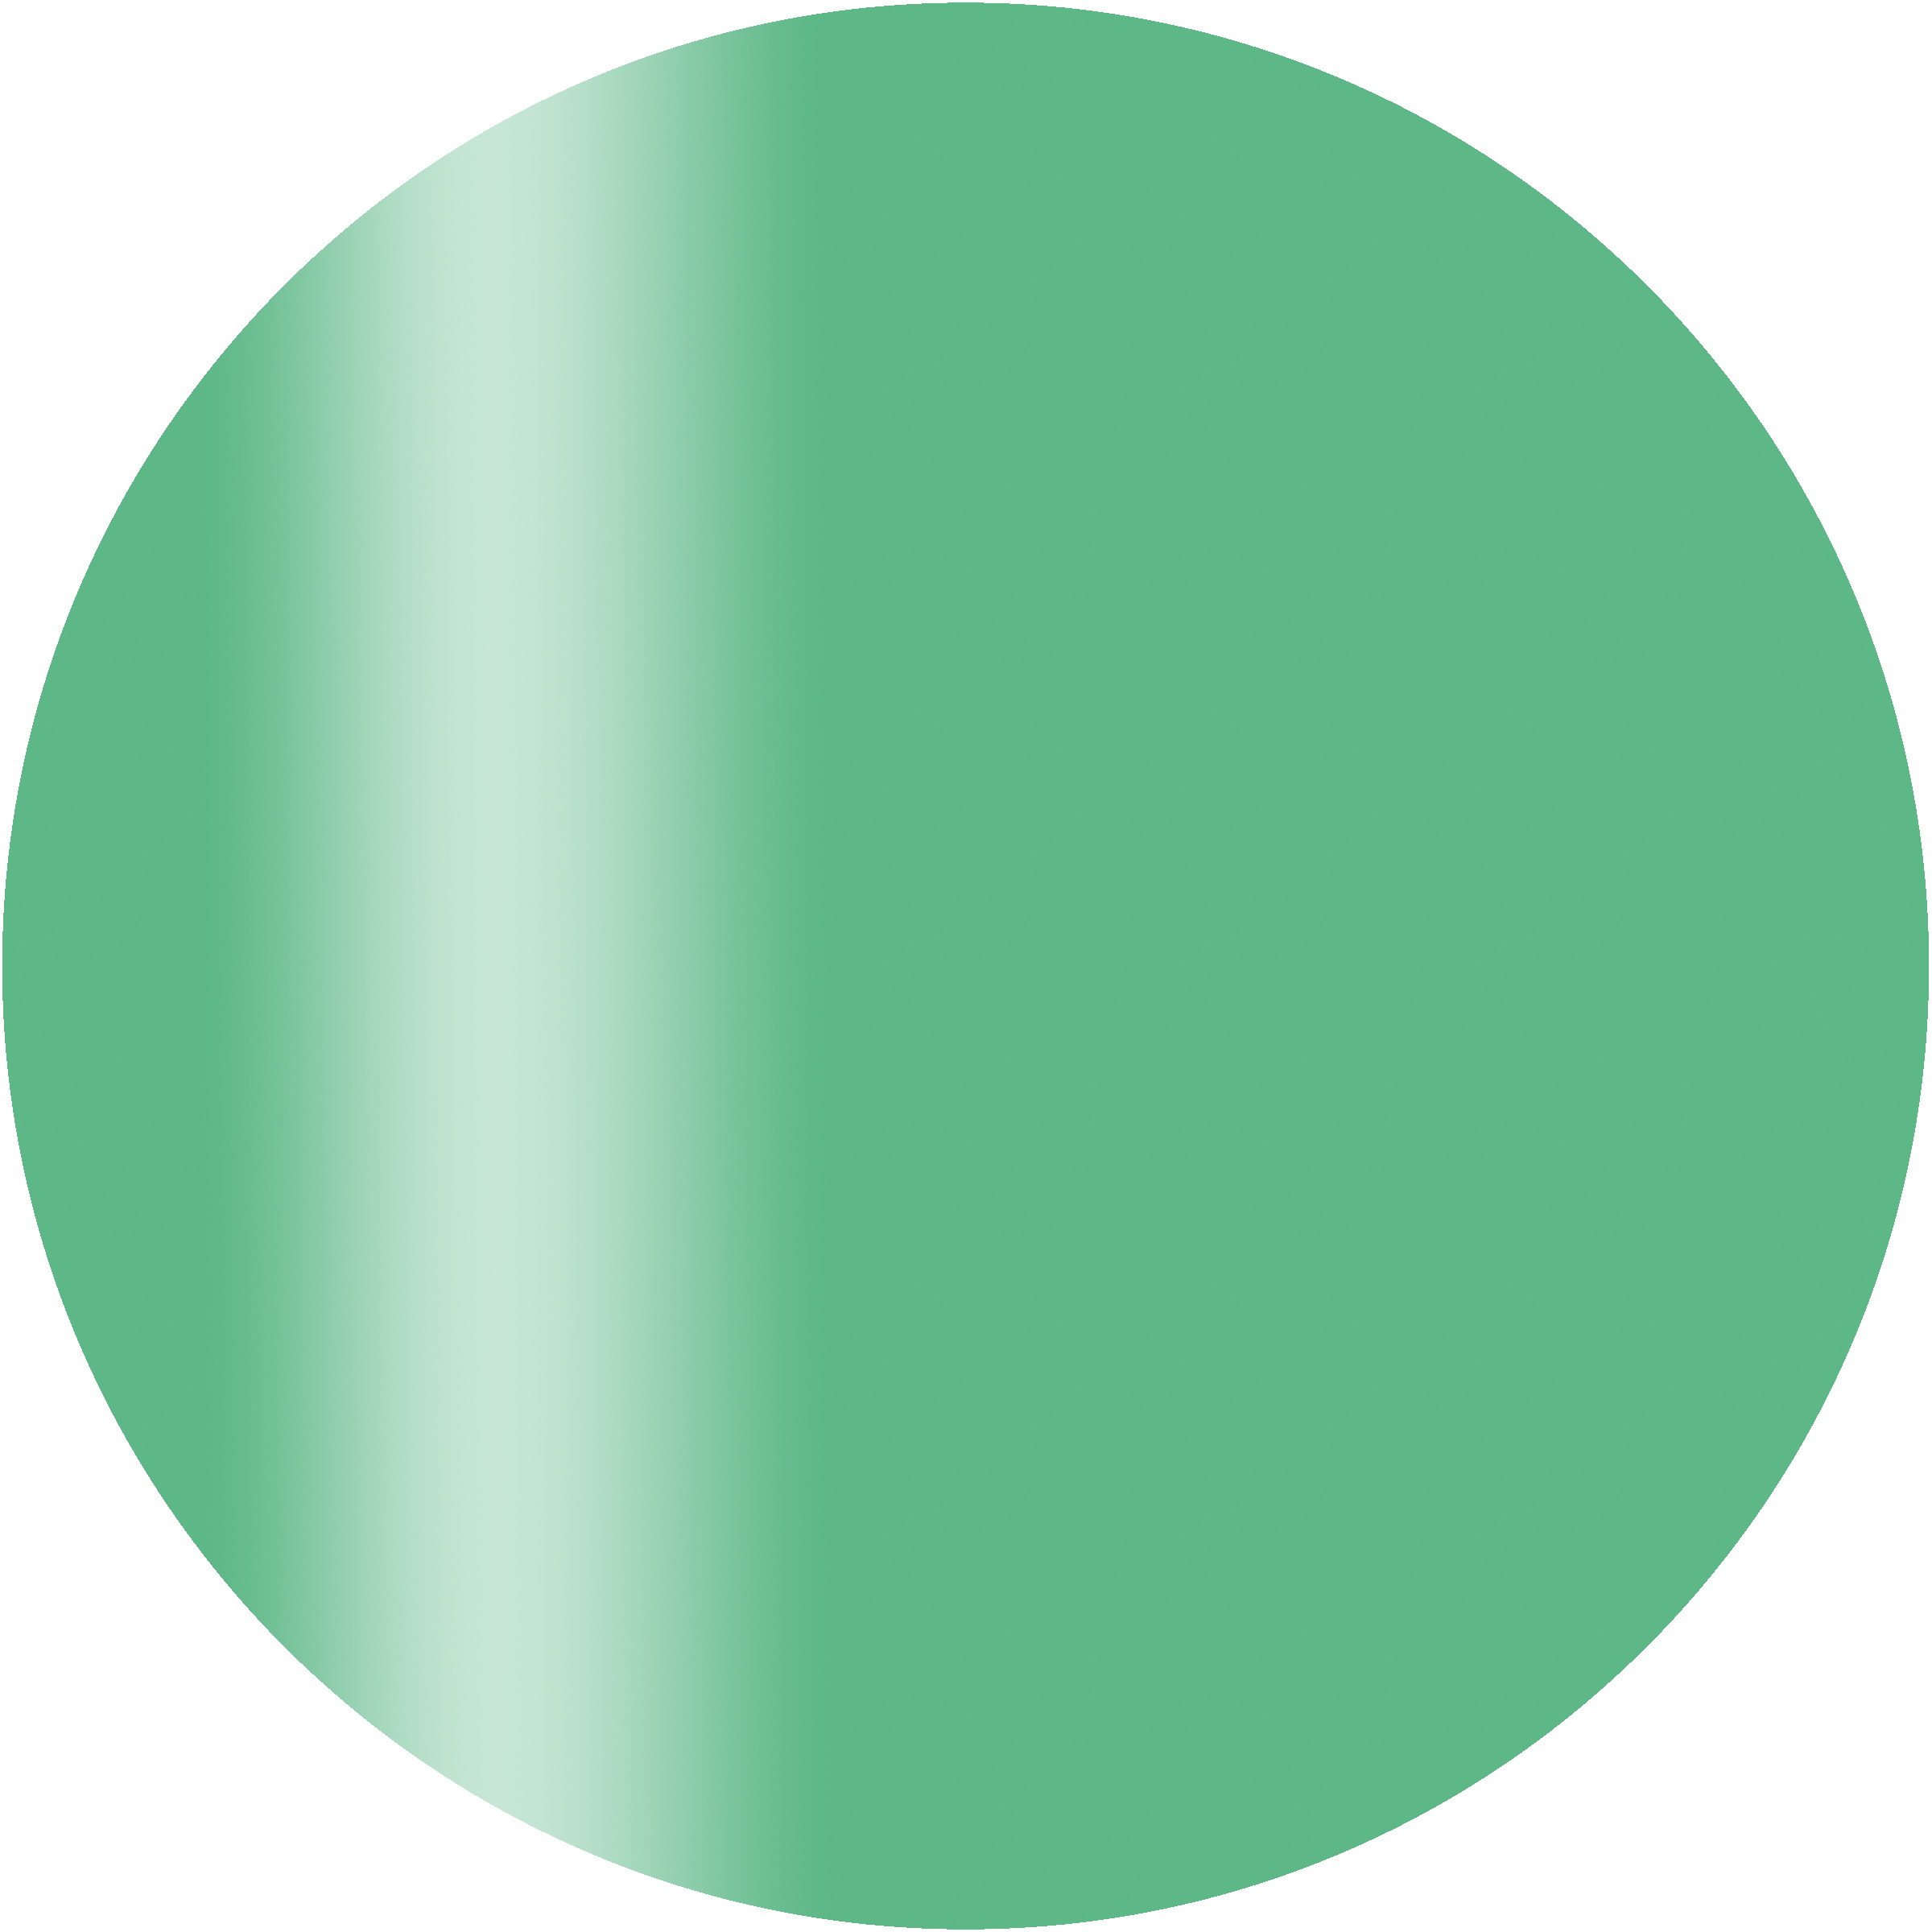 CGS04GR カラーカルジェル プラス ジェードグリーン 2.5g